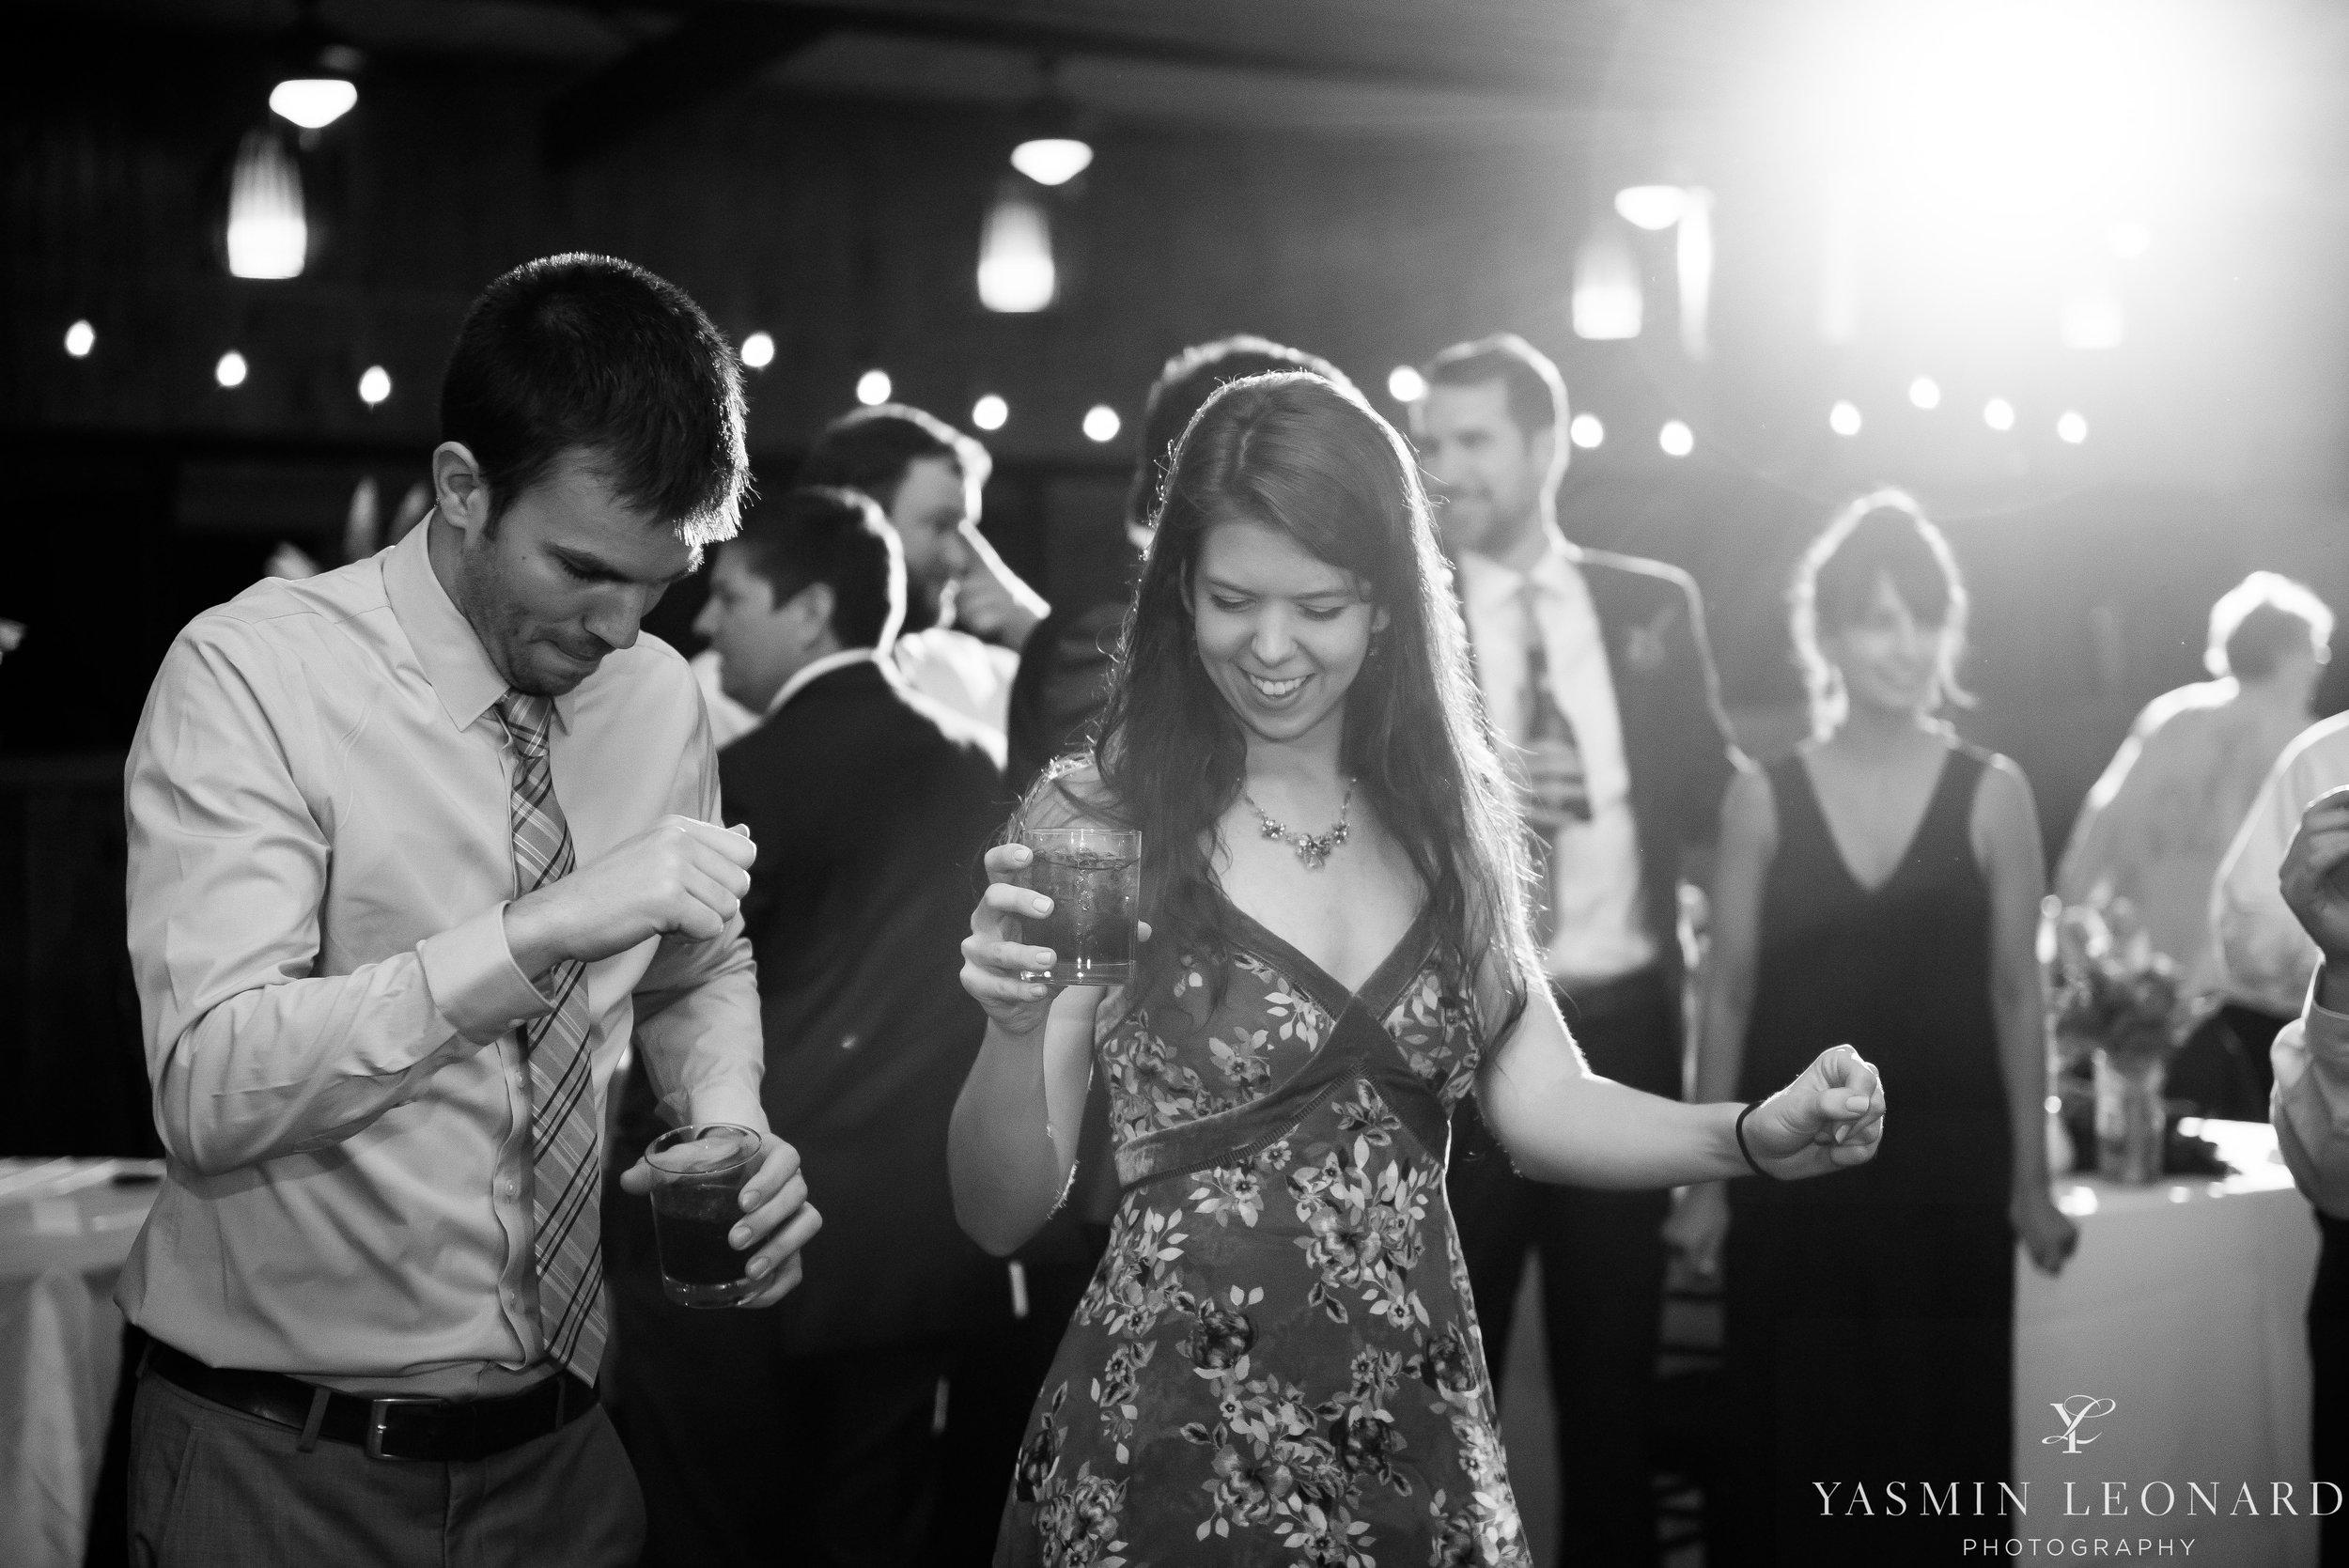 Adaumont Farm - Adaumont Farm Weddings - Trinity Weddings - NC Weddings - Yasmin Leonard Photography-88.jpg